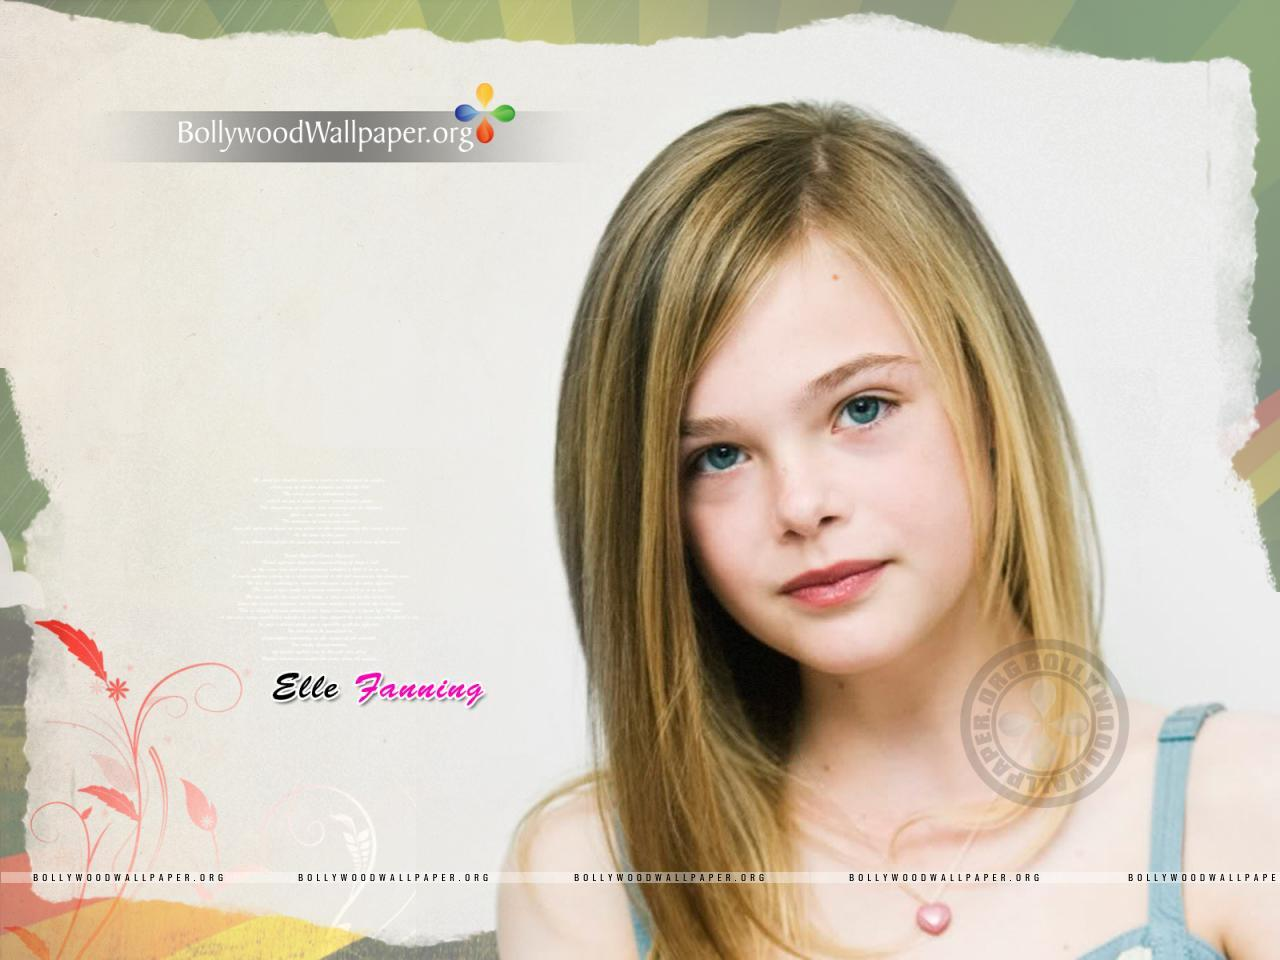 Elle Fanning - Photo Actress